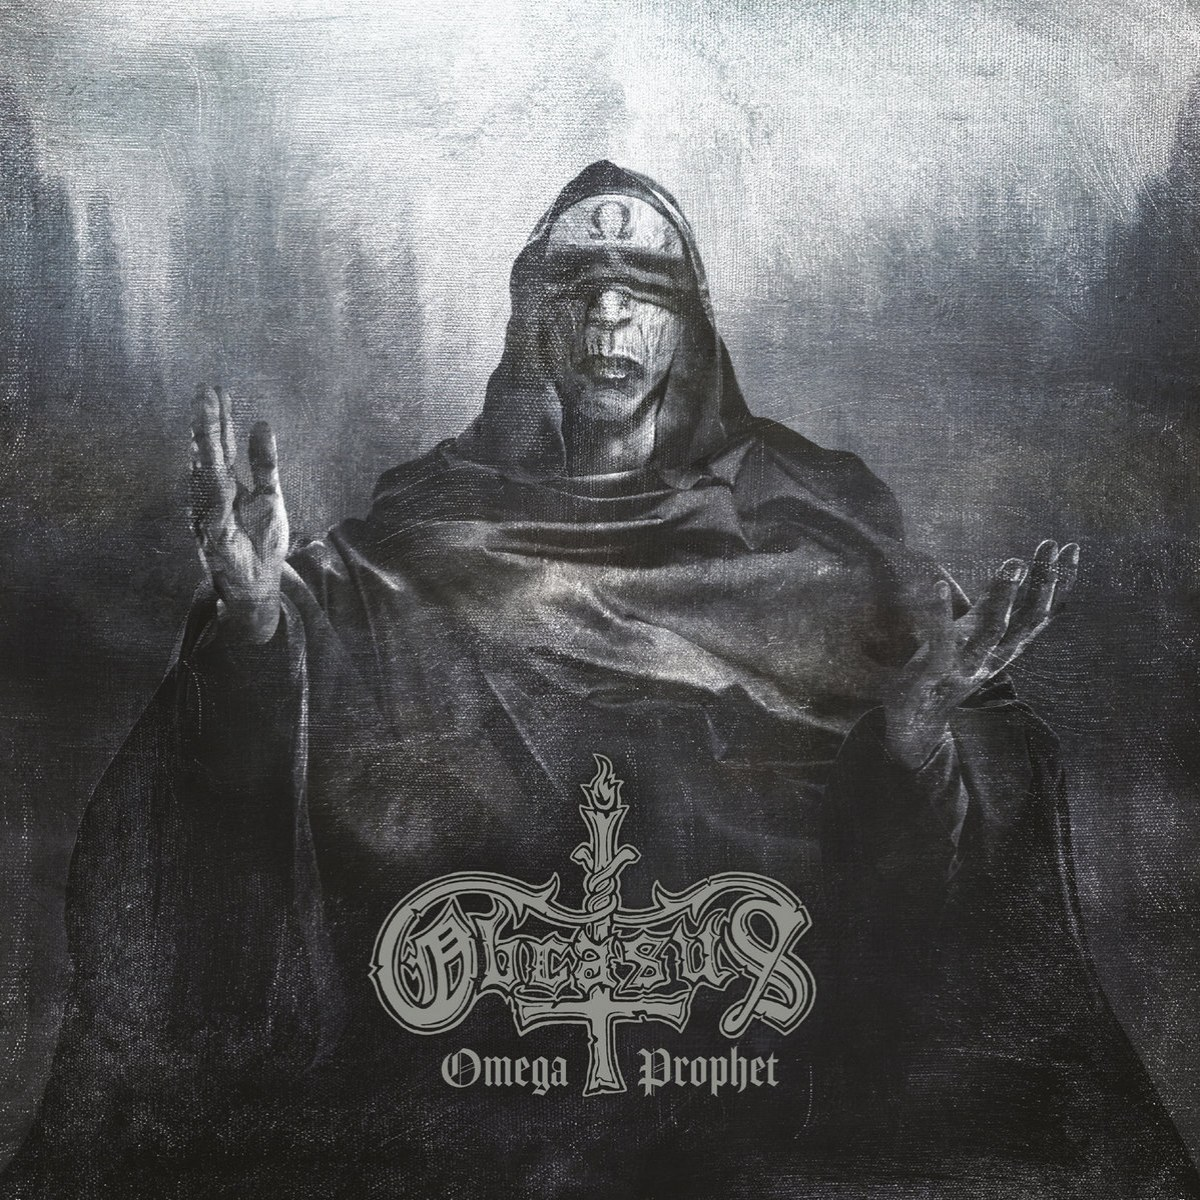 Reviews for Obcasus - Omega Prophet